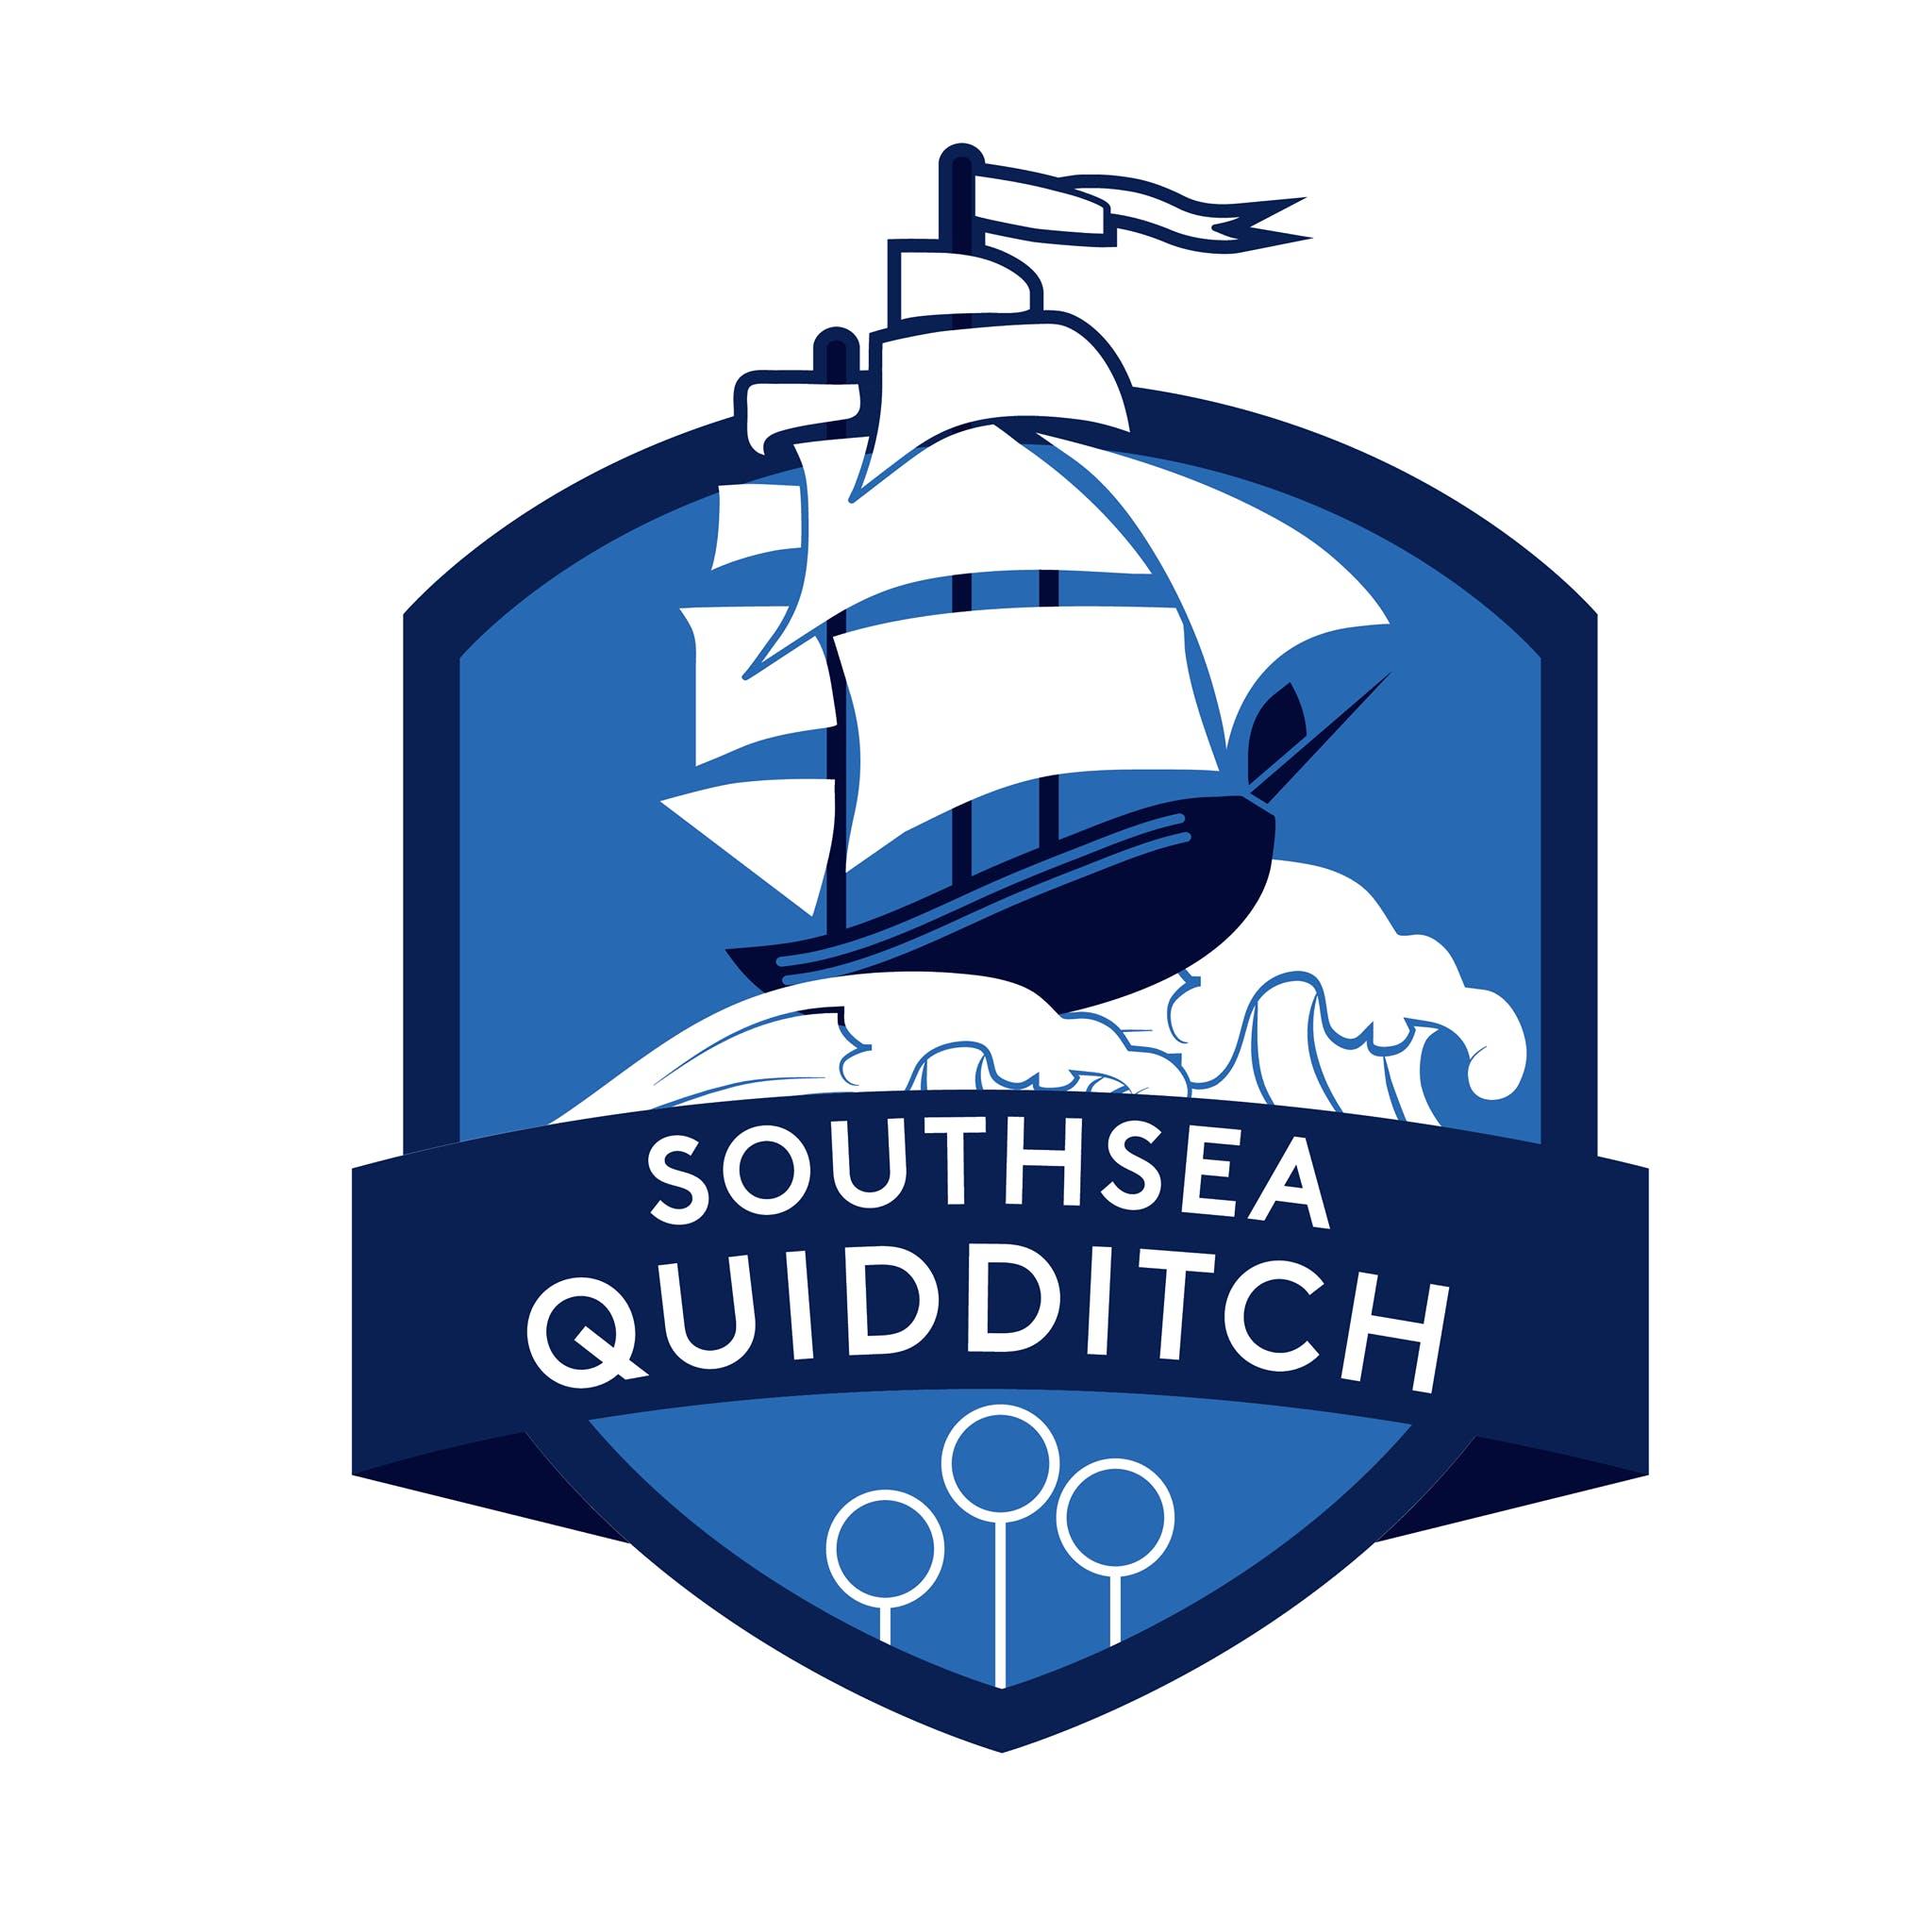 Southsea Quidditch logo